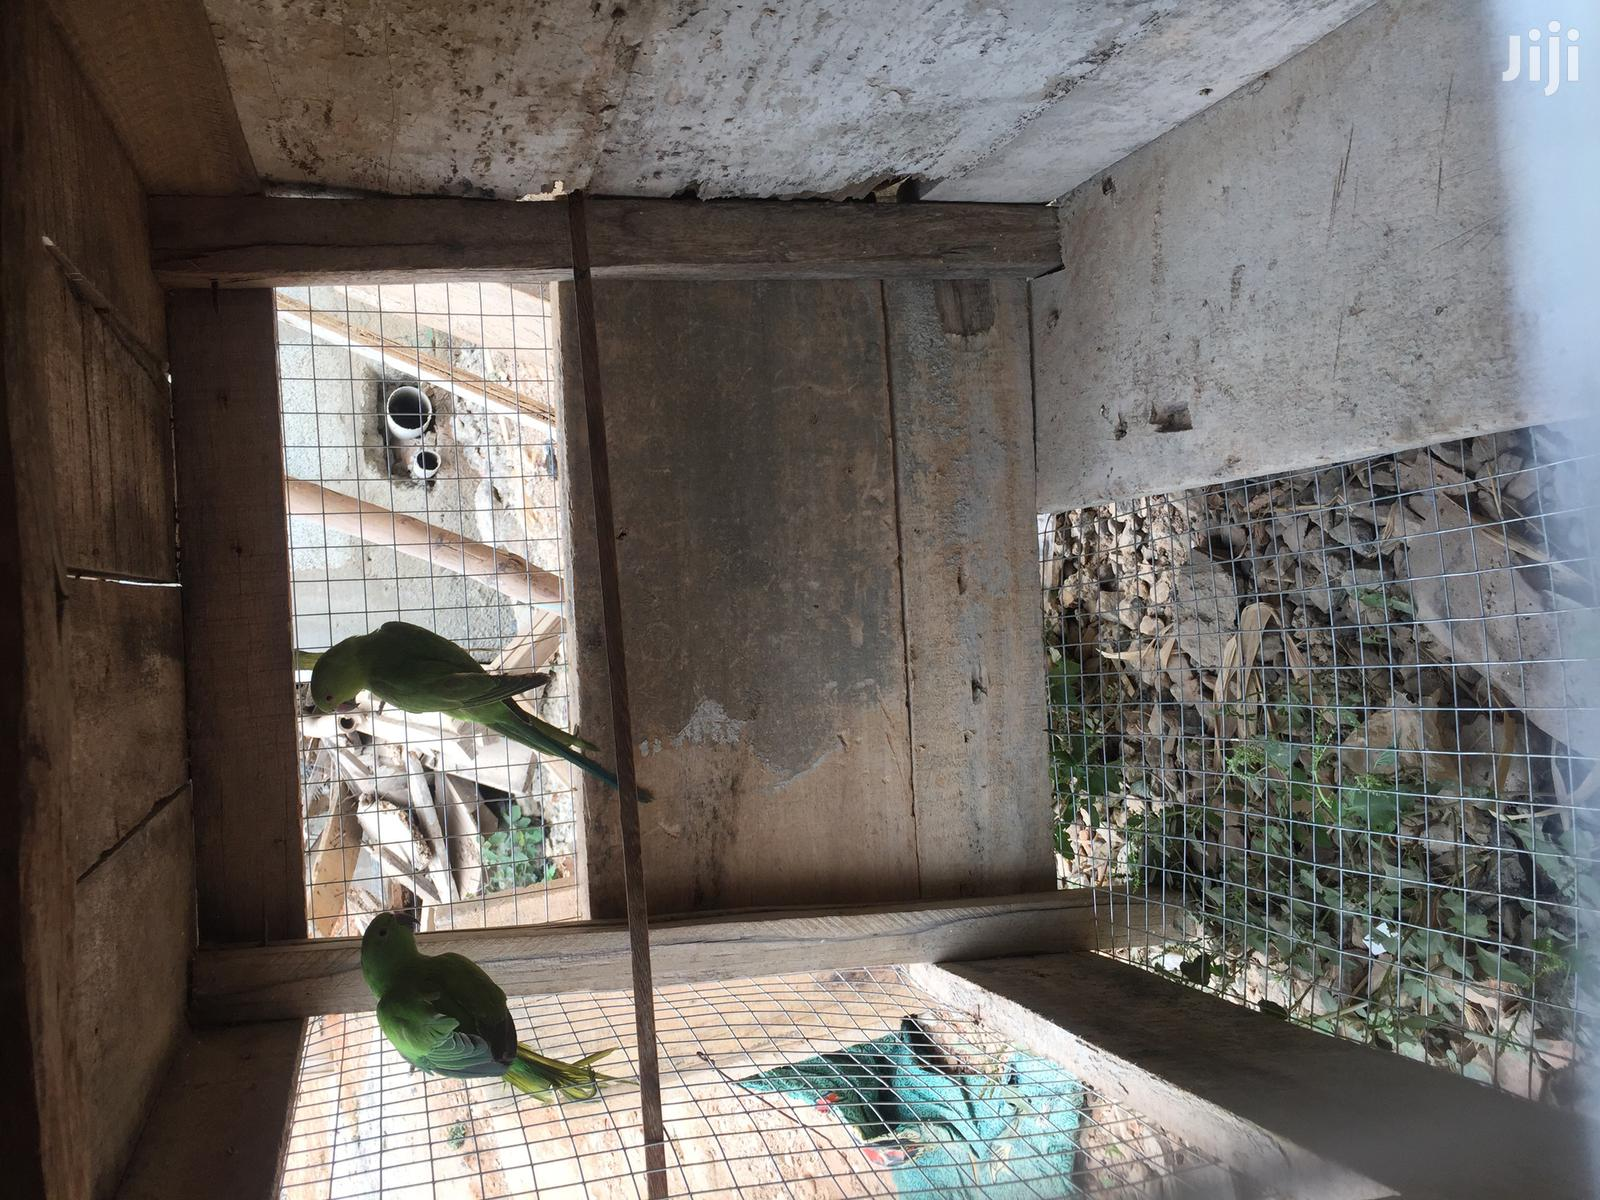 African Ringneck Parrot | Birds for sale in Abossey Okai, Greater Accra, Ghana